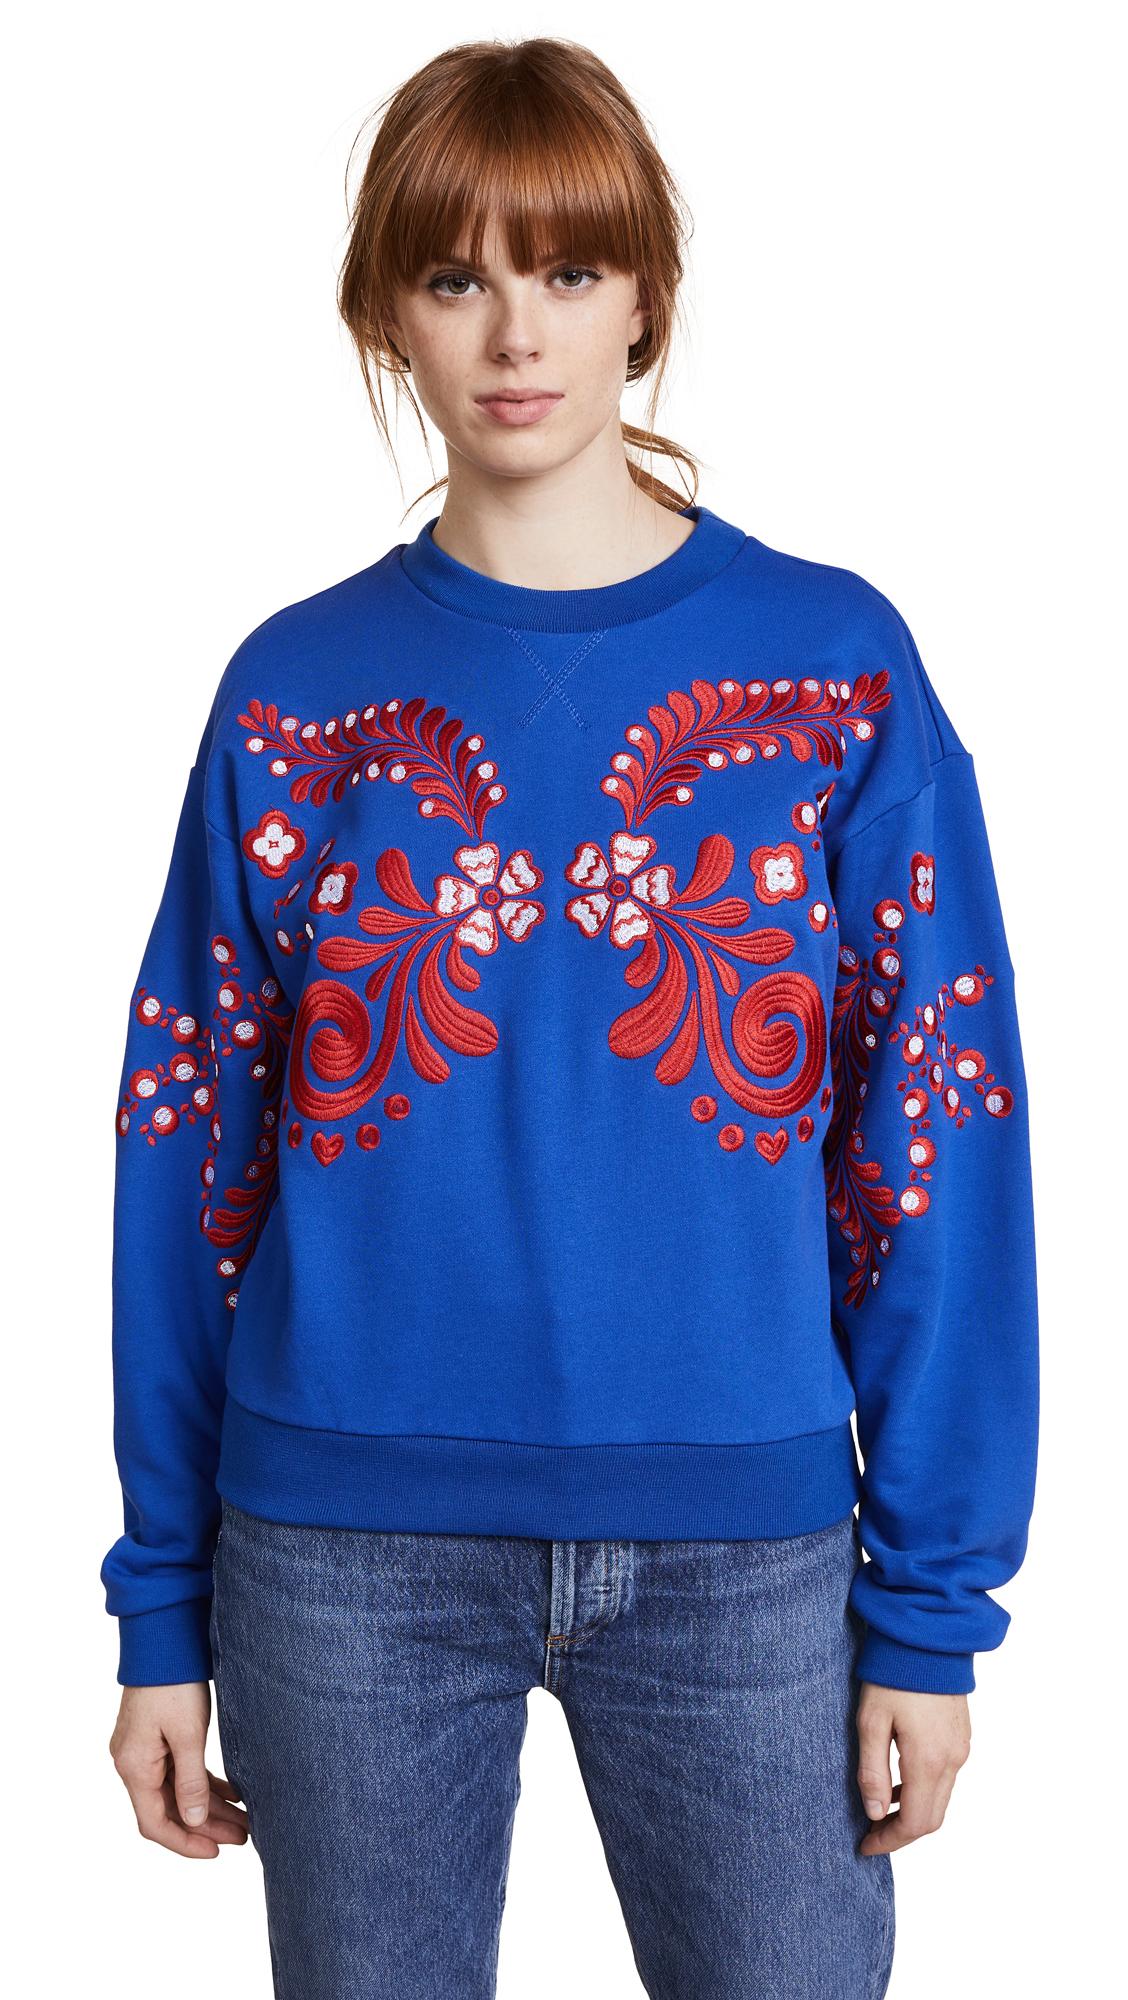 Cynthia Rowley Bleecker Embroidered Sweatshirt In Royal